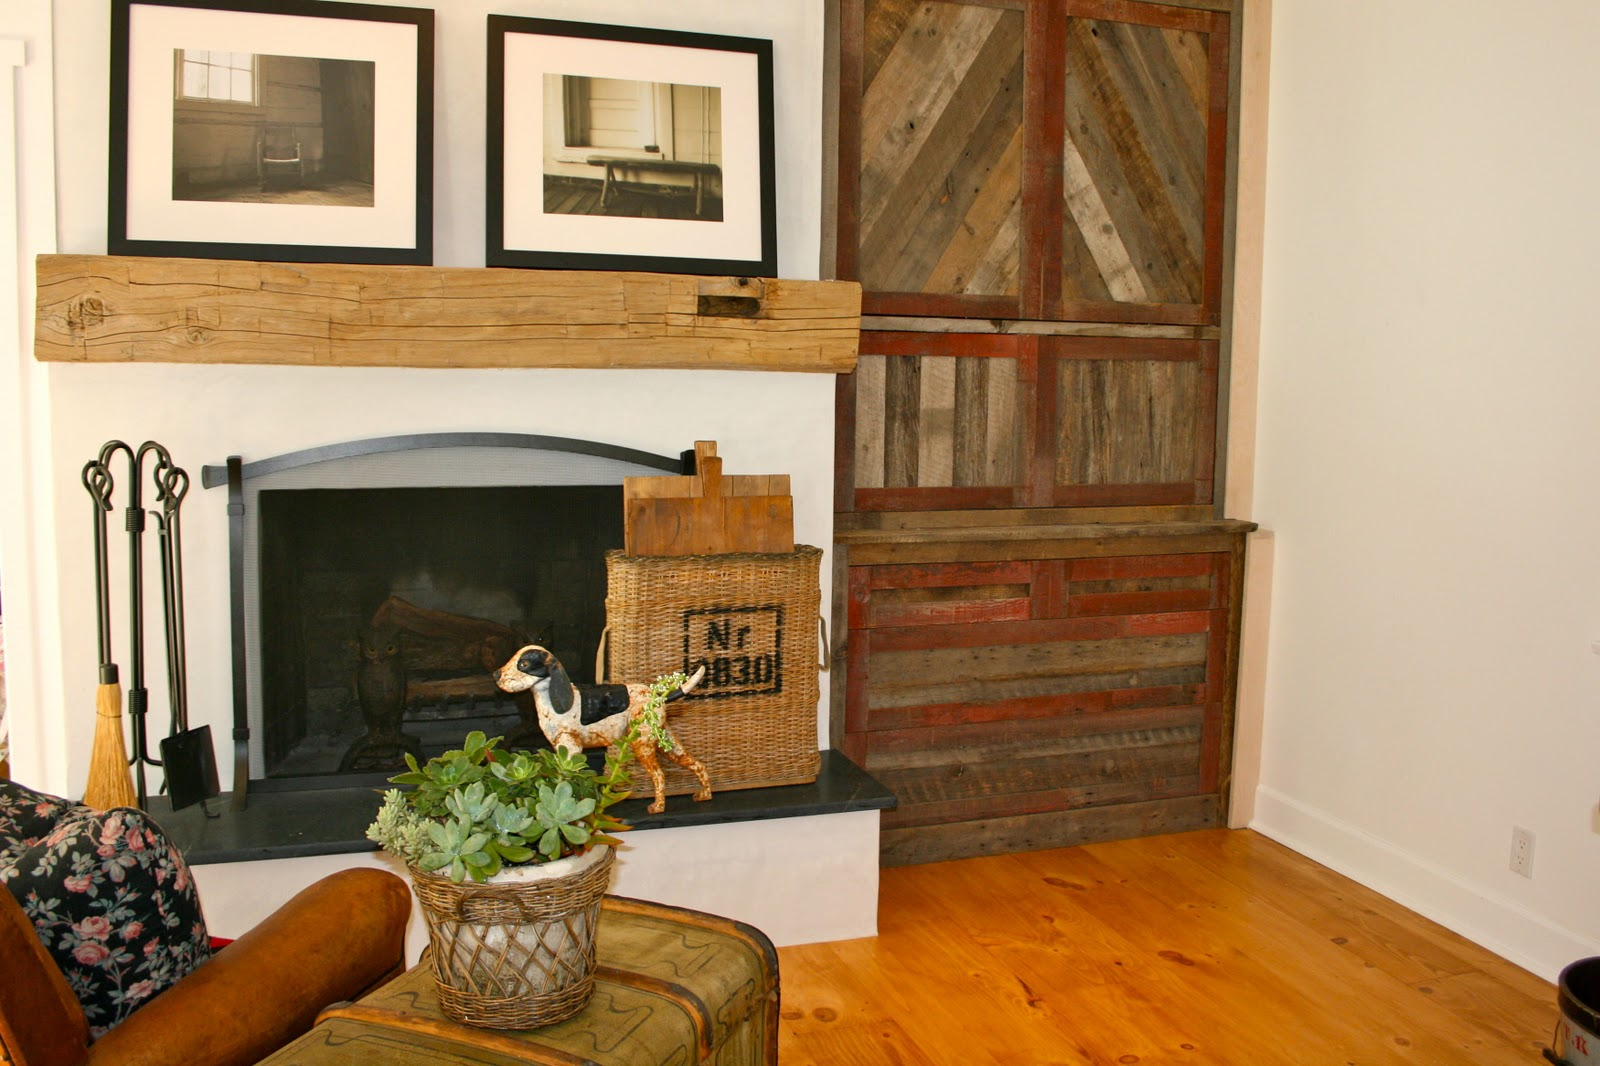 done wood surround fireplace reclaimed gallery barnwood on imgur album using barn